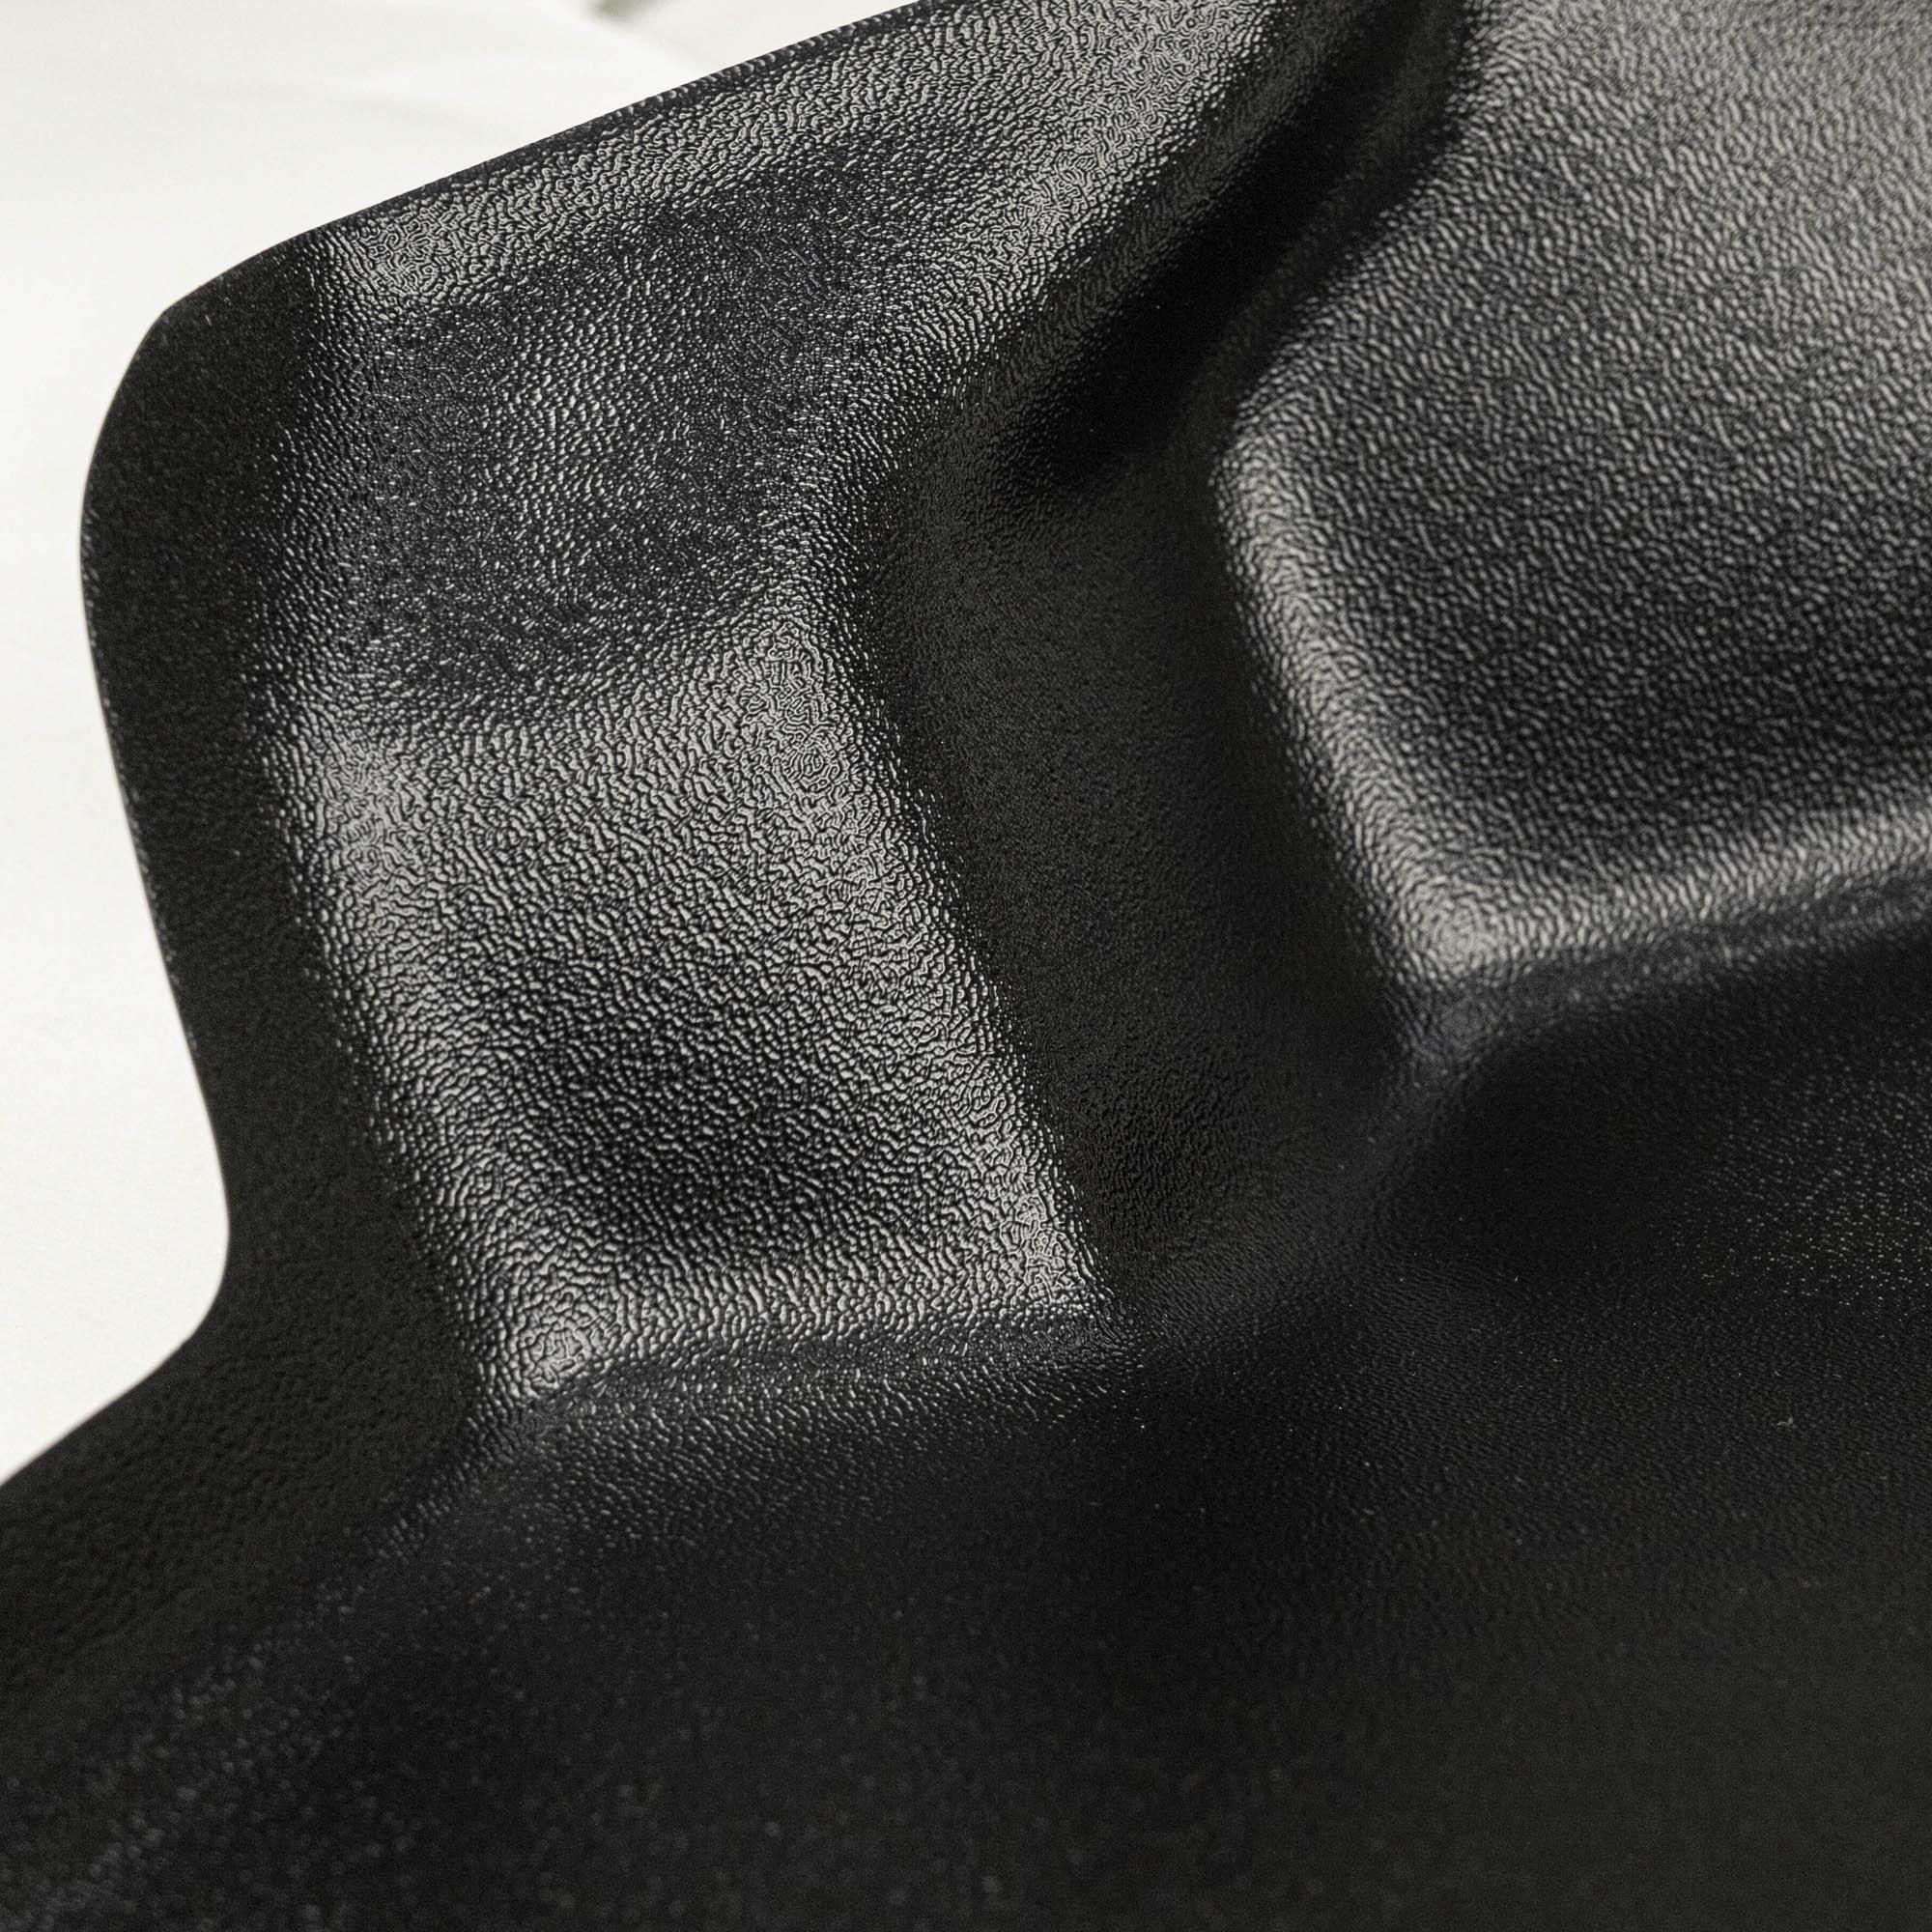 накладки на ковролин тонель дастер 2021 3